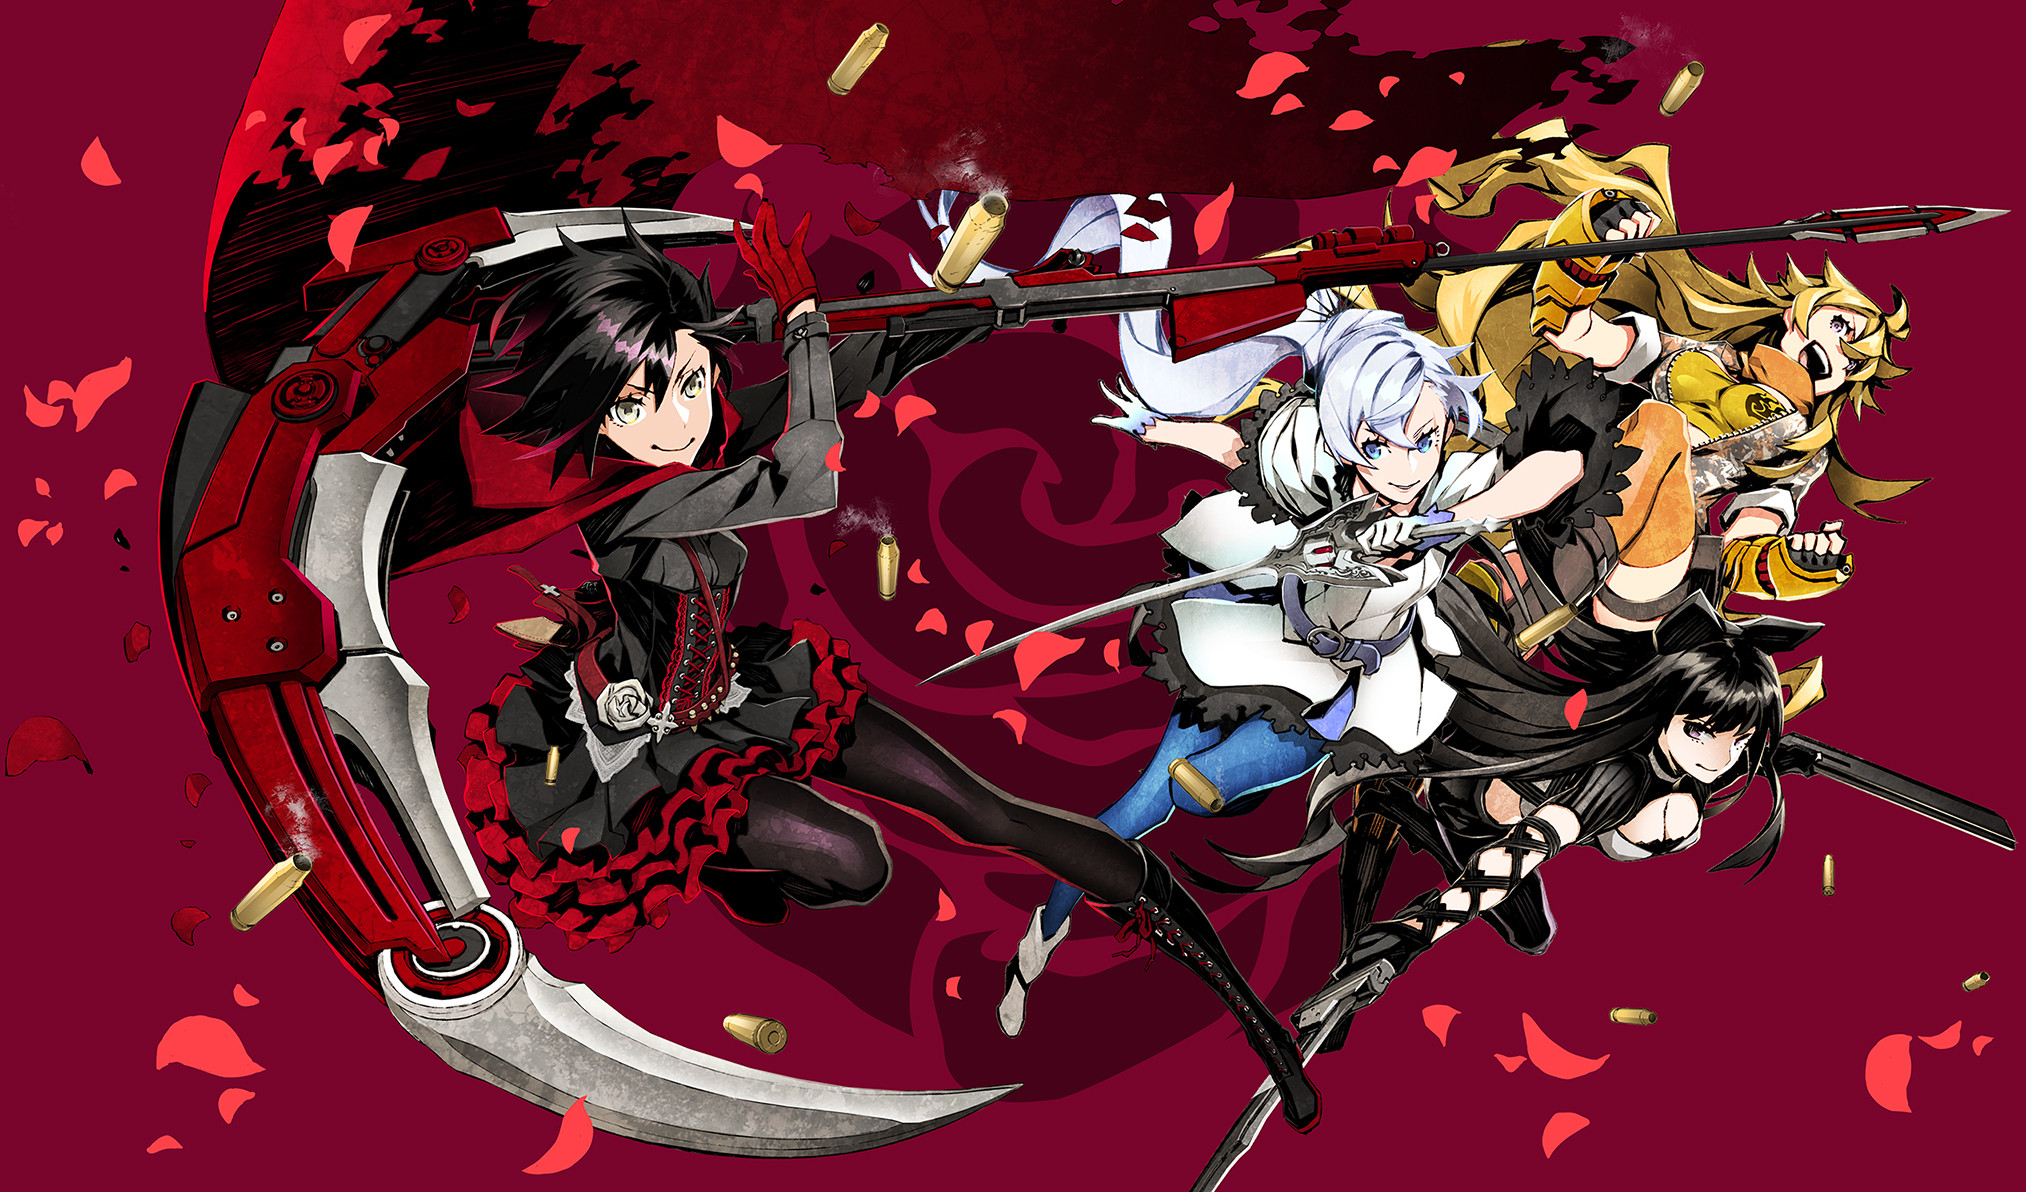 Anime – RWBY Blake Belladonna Ruby Rose (RWBY) Weiss Schnee Yang Xiao Long  Wallpaper